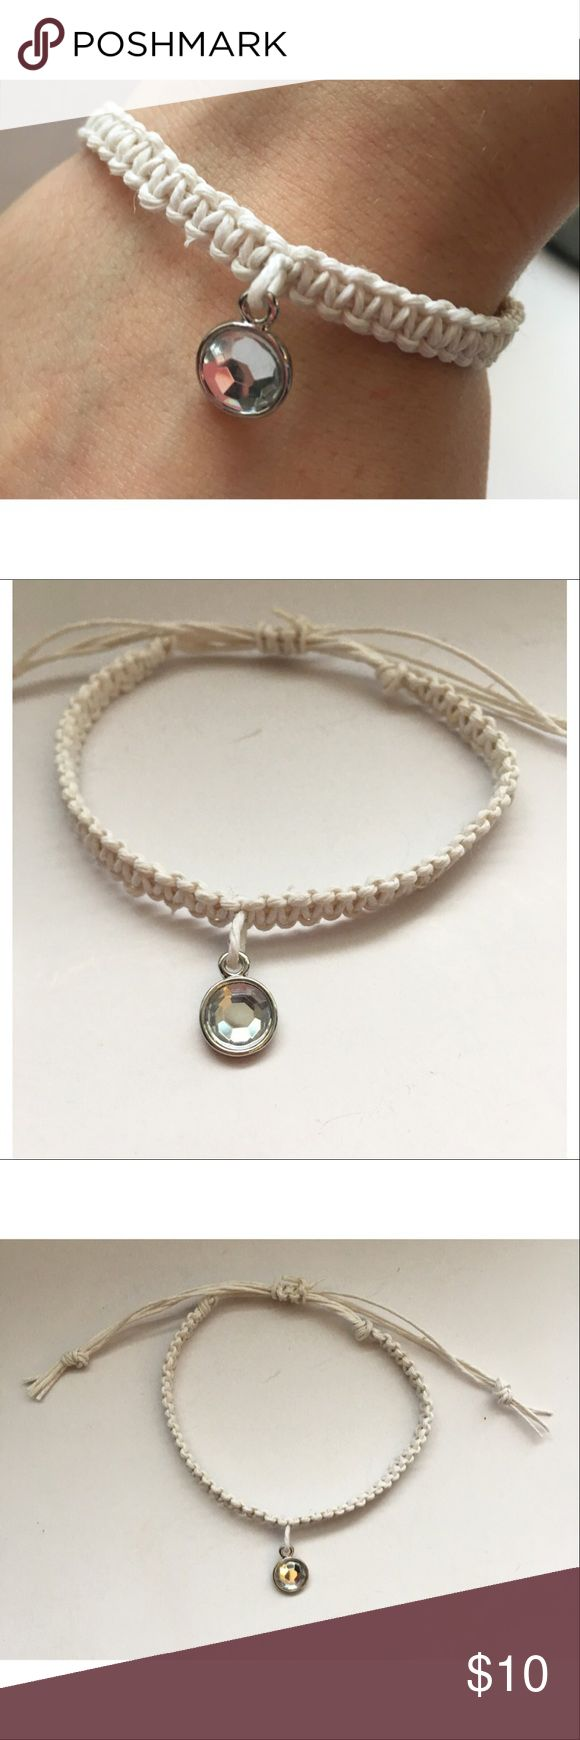 Handmade White Hemp Rhinestone Charm Bracelet ☾ Handmade  ♡ ☾ Size  Adjustable 7